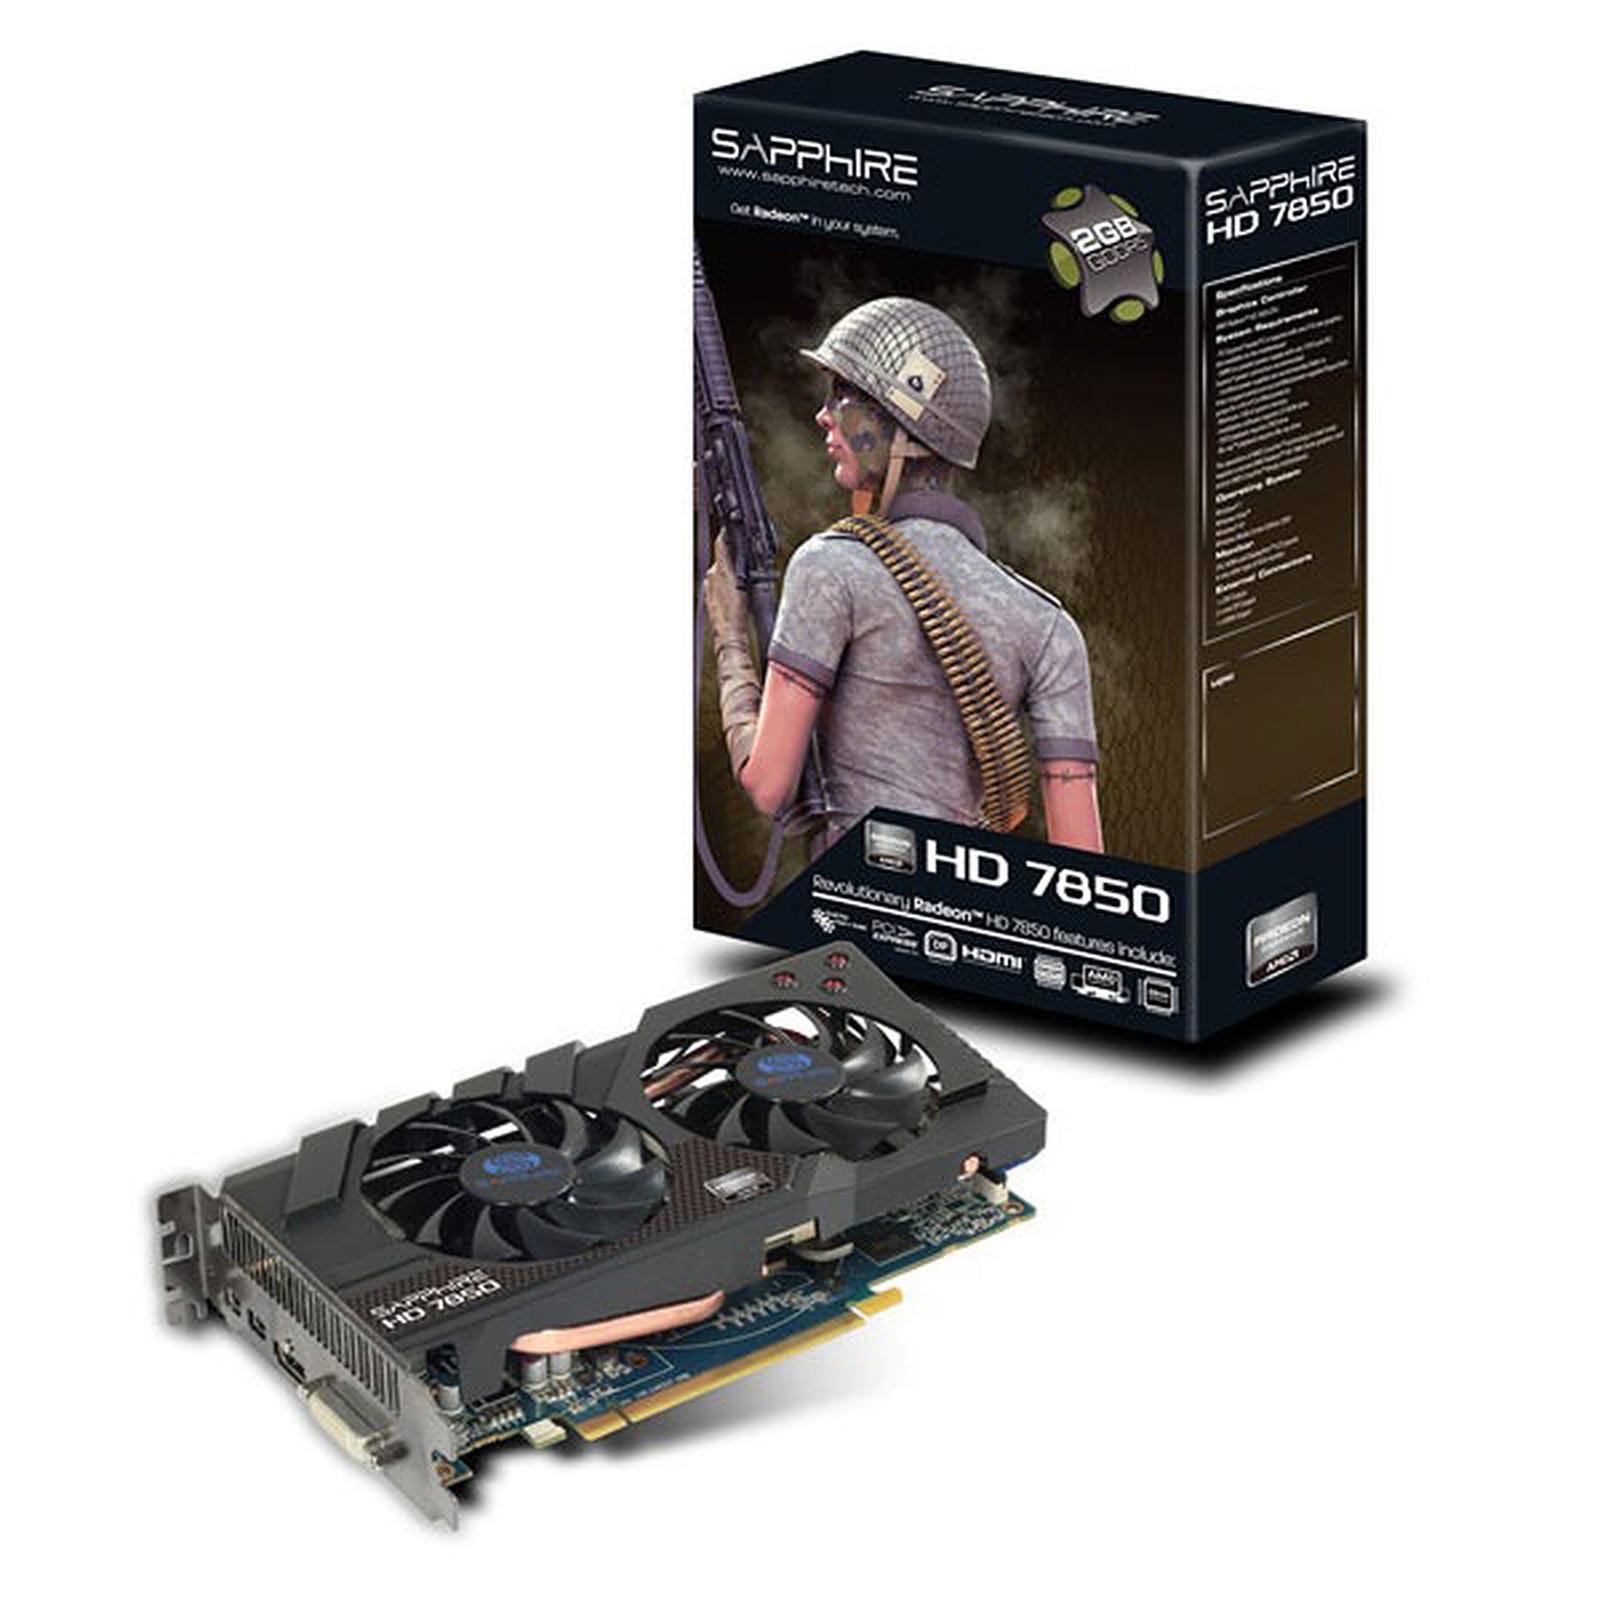 Sapphire Radeon HD 7850 2 Go